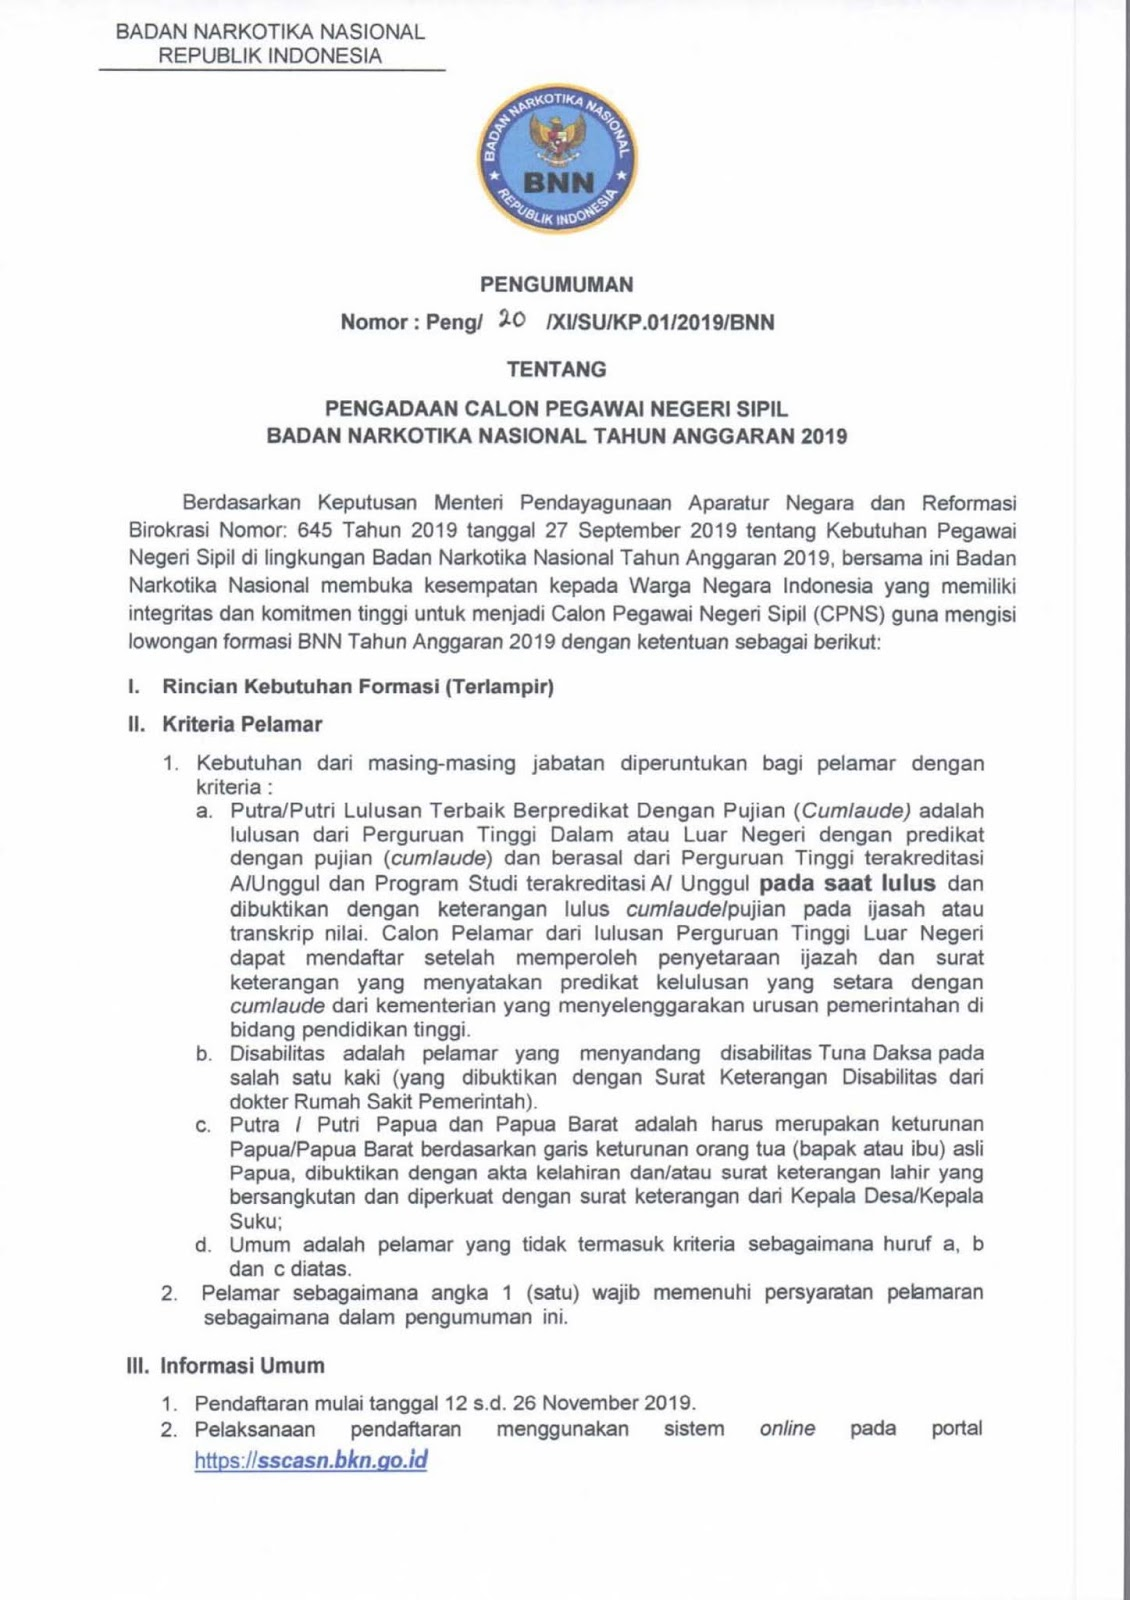 Lowongan CPNS Badan Narkotika Nasional Tahun Anggaran 2019 (154 Formasi)